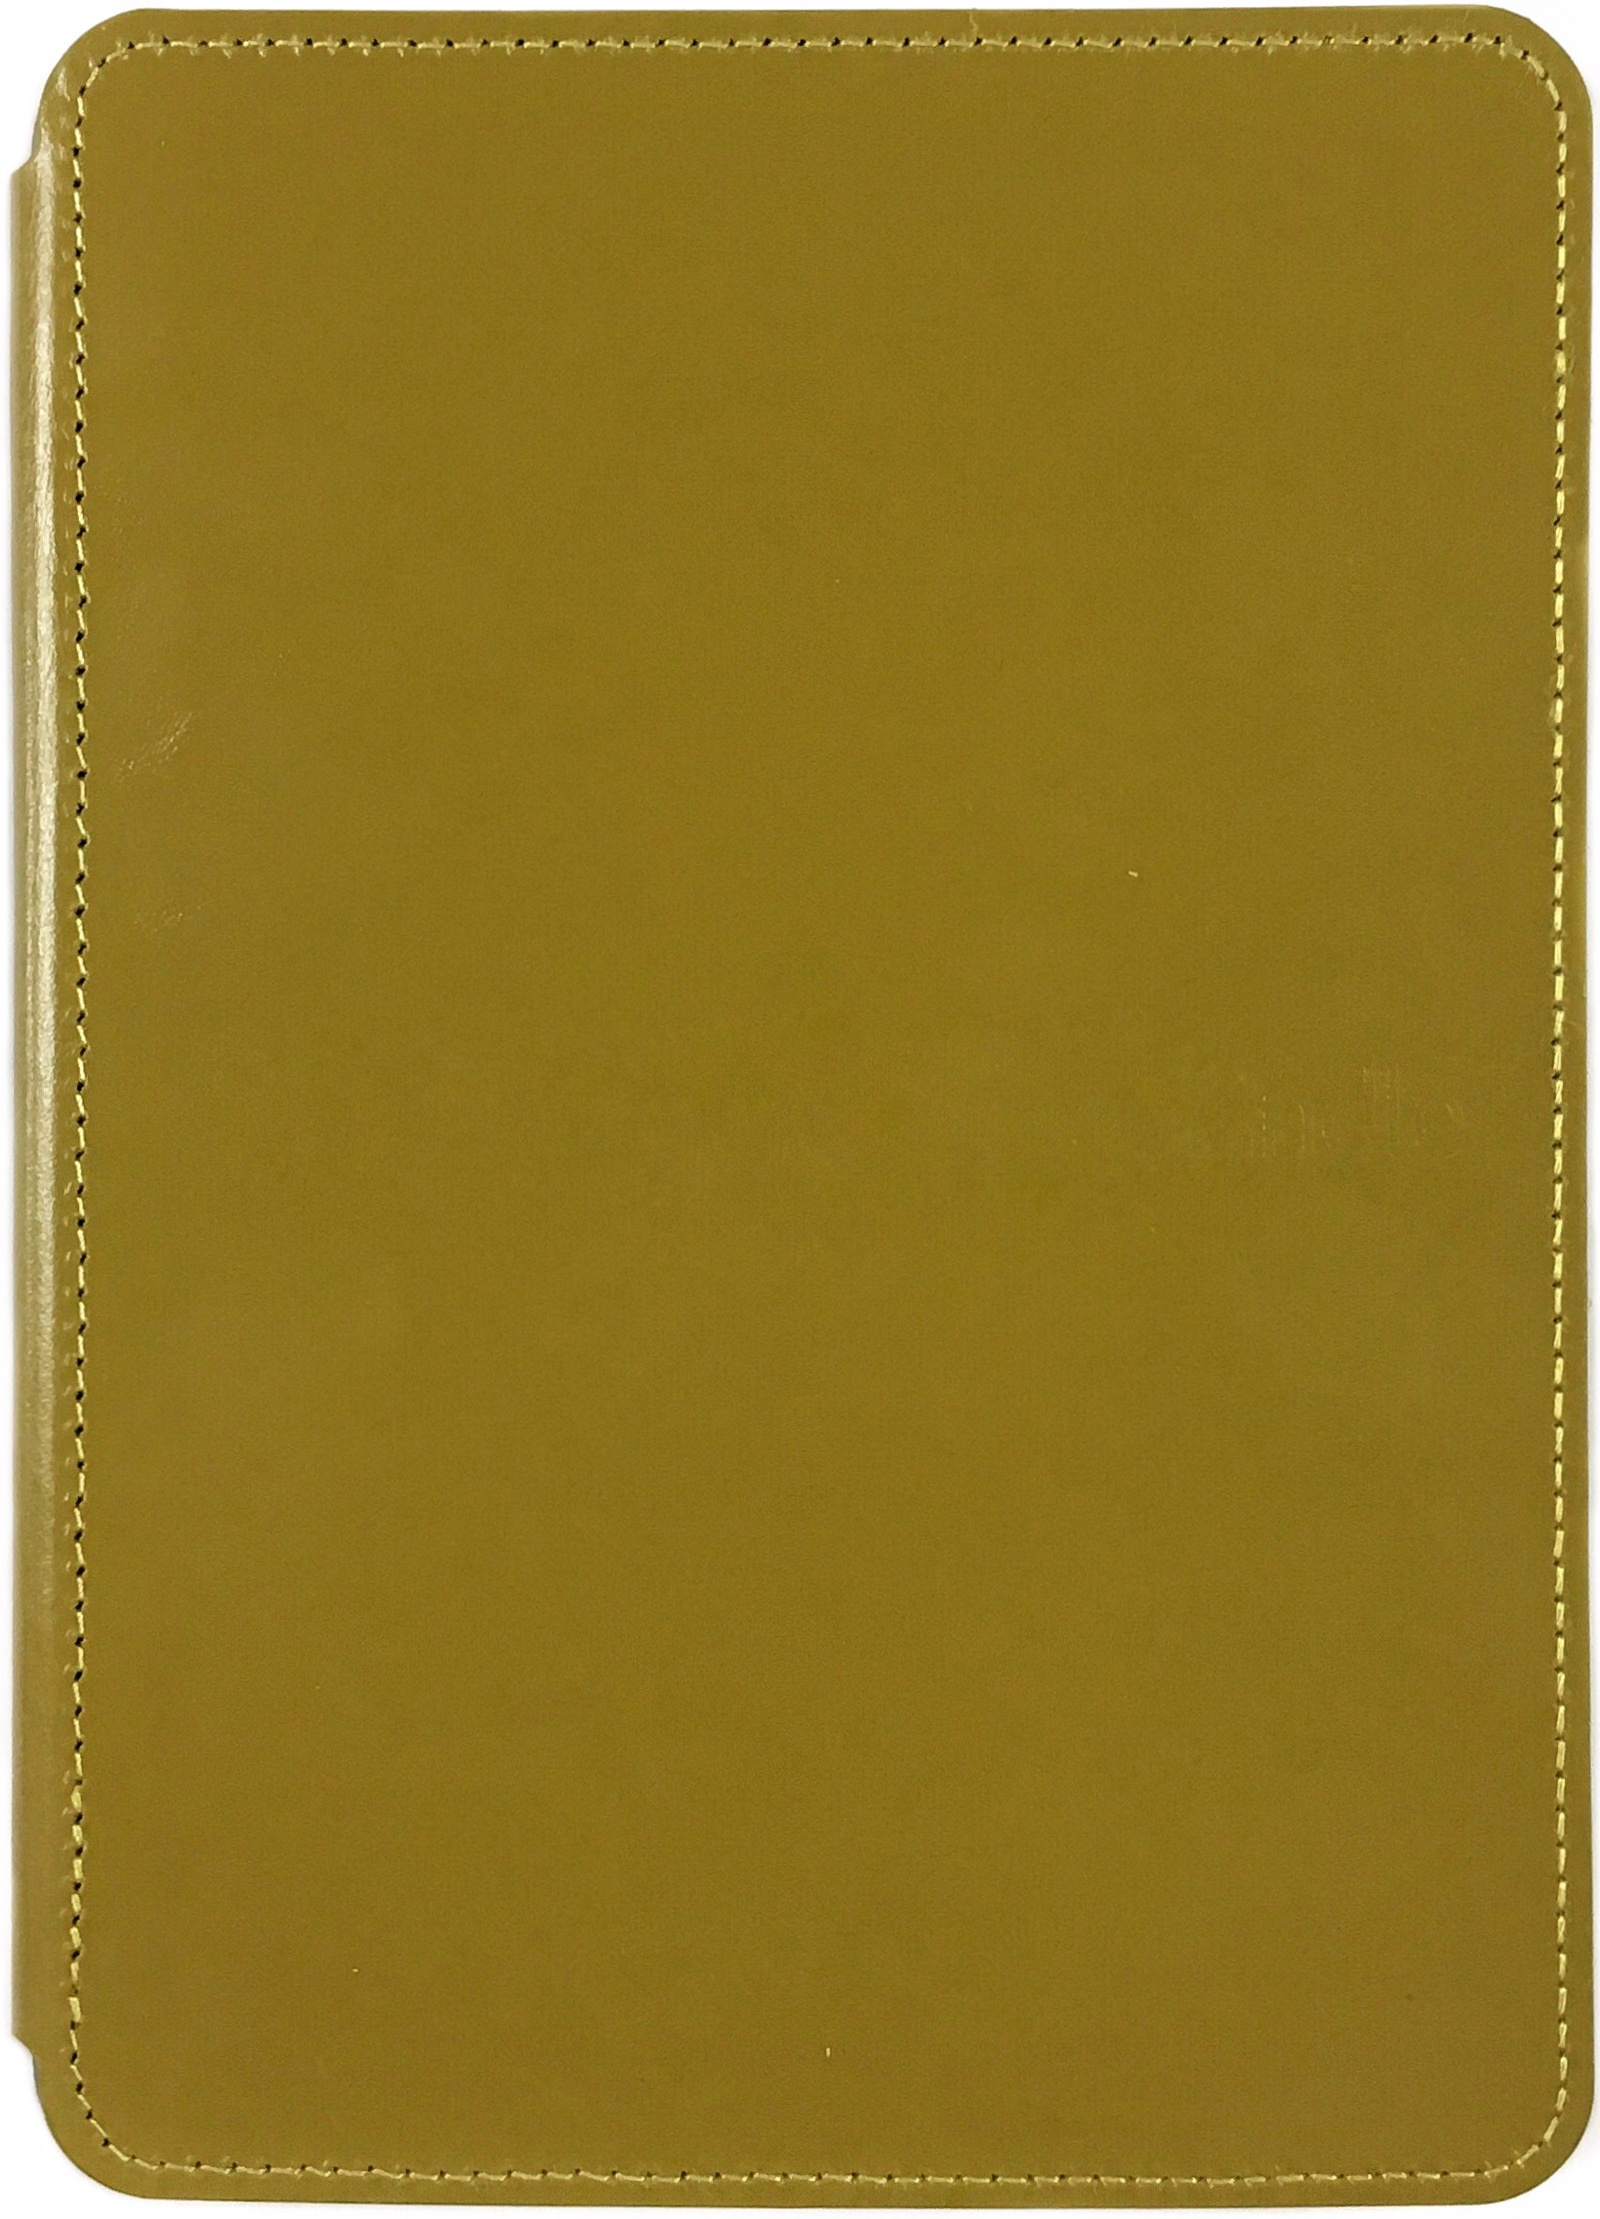 Чехол Amazon Leather Cover для Kindle 5, Оливковый